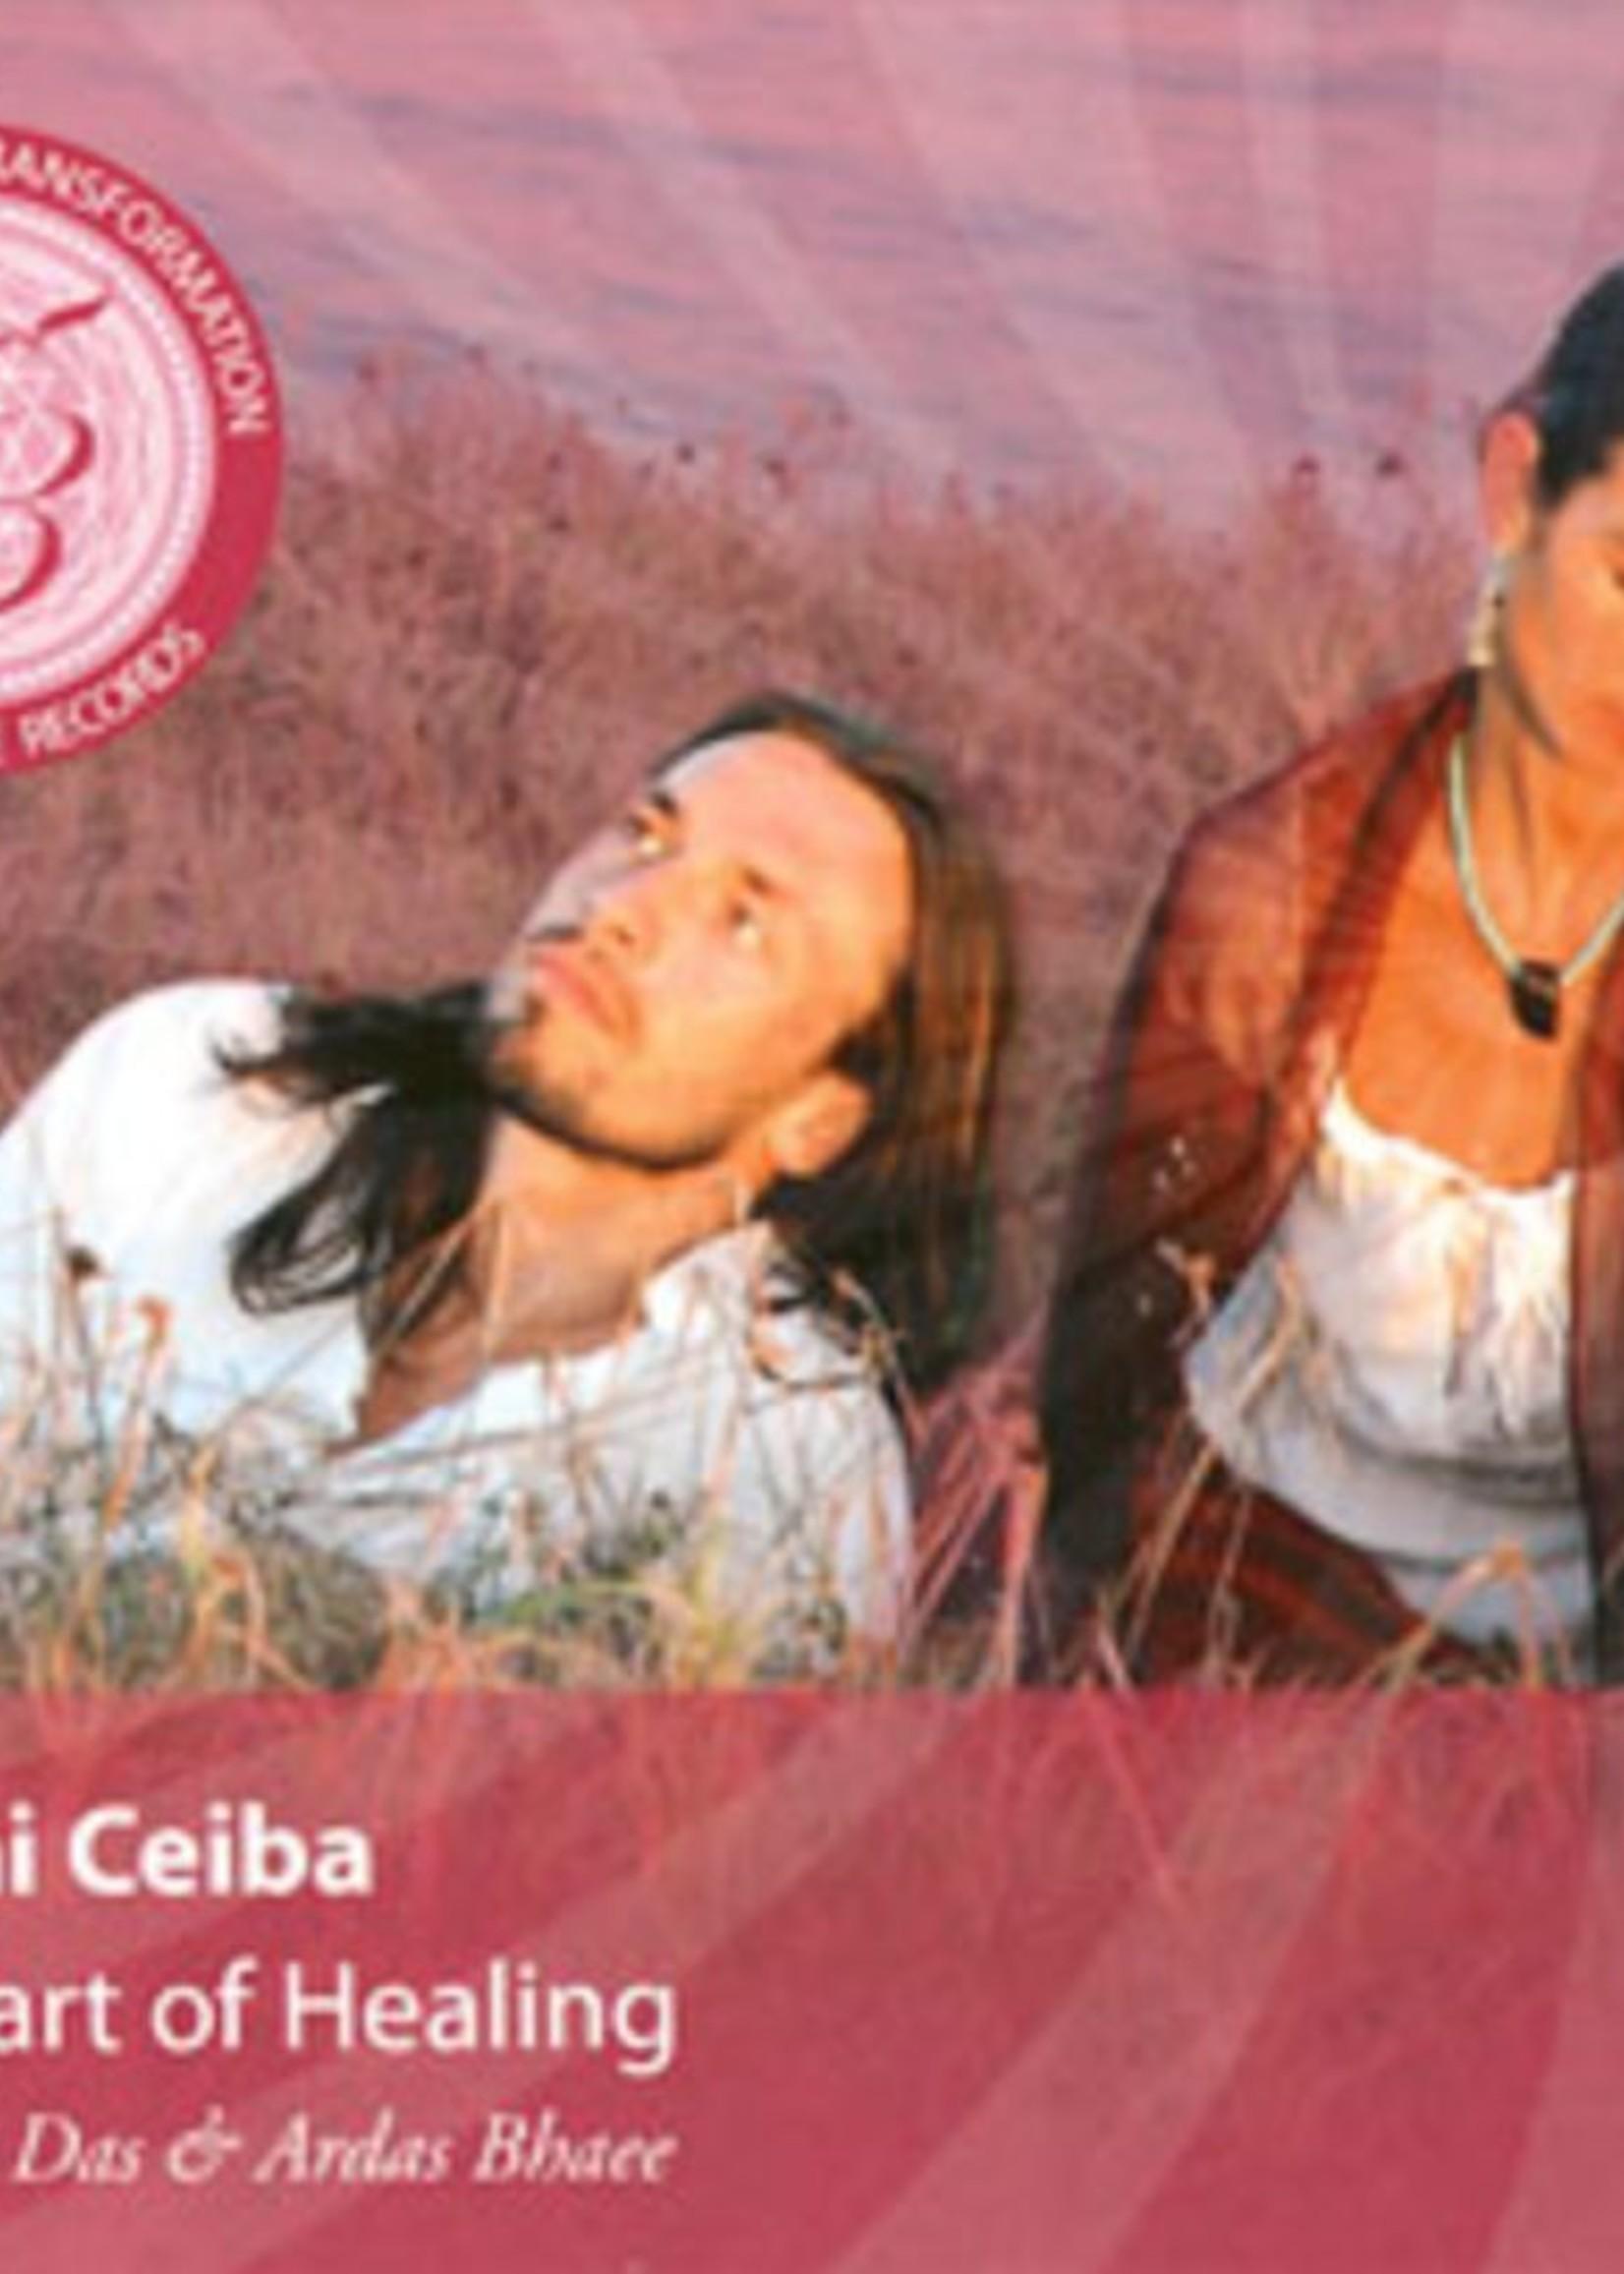 Mirabai Ceiba Meditations for Transformation | The Heart of Healing